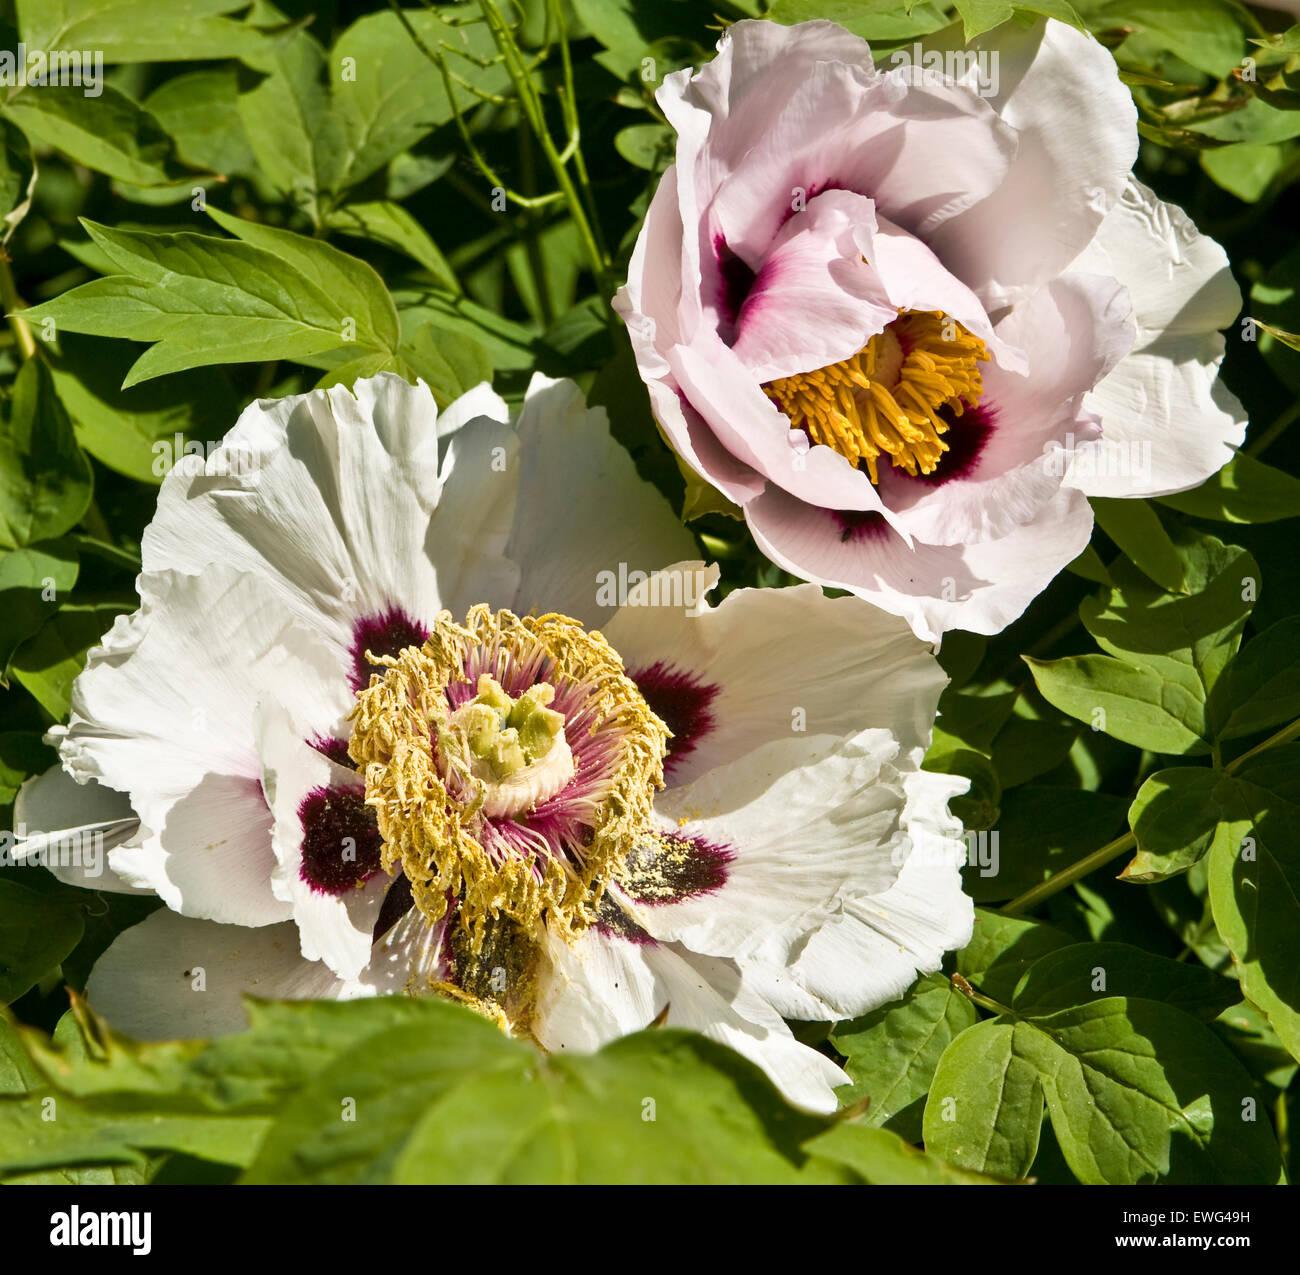 Two big white flowers of treelike peony Stock Photo: 84562509 - Alamy